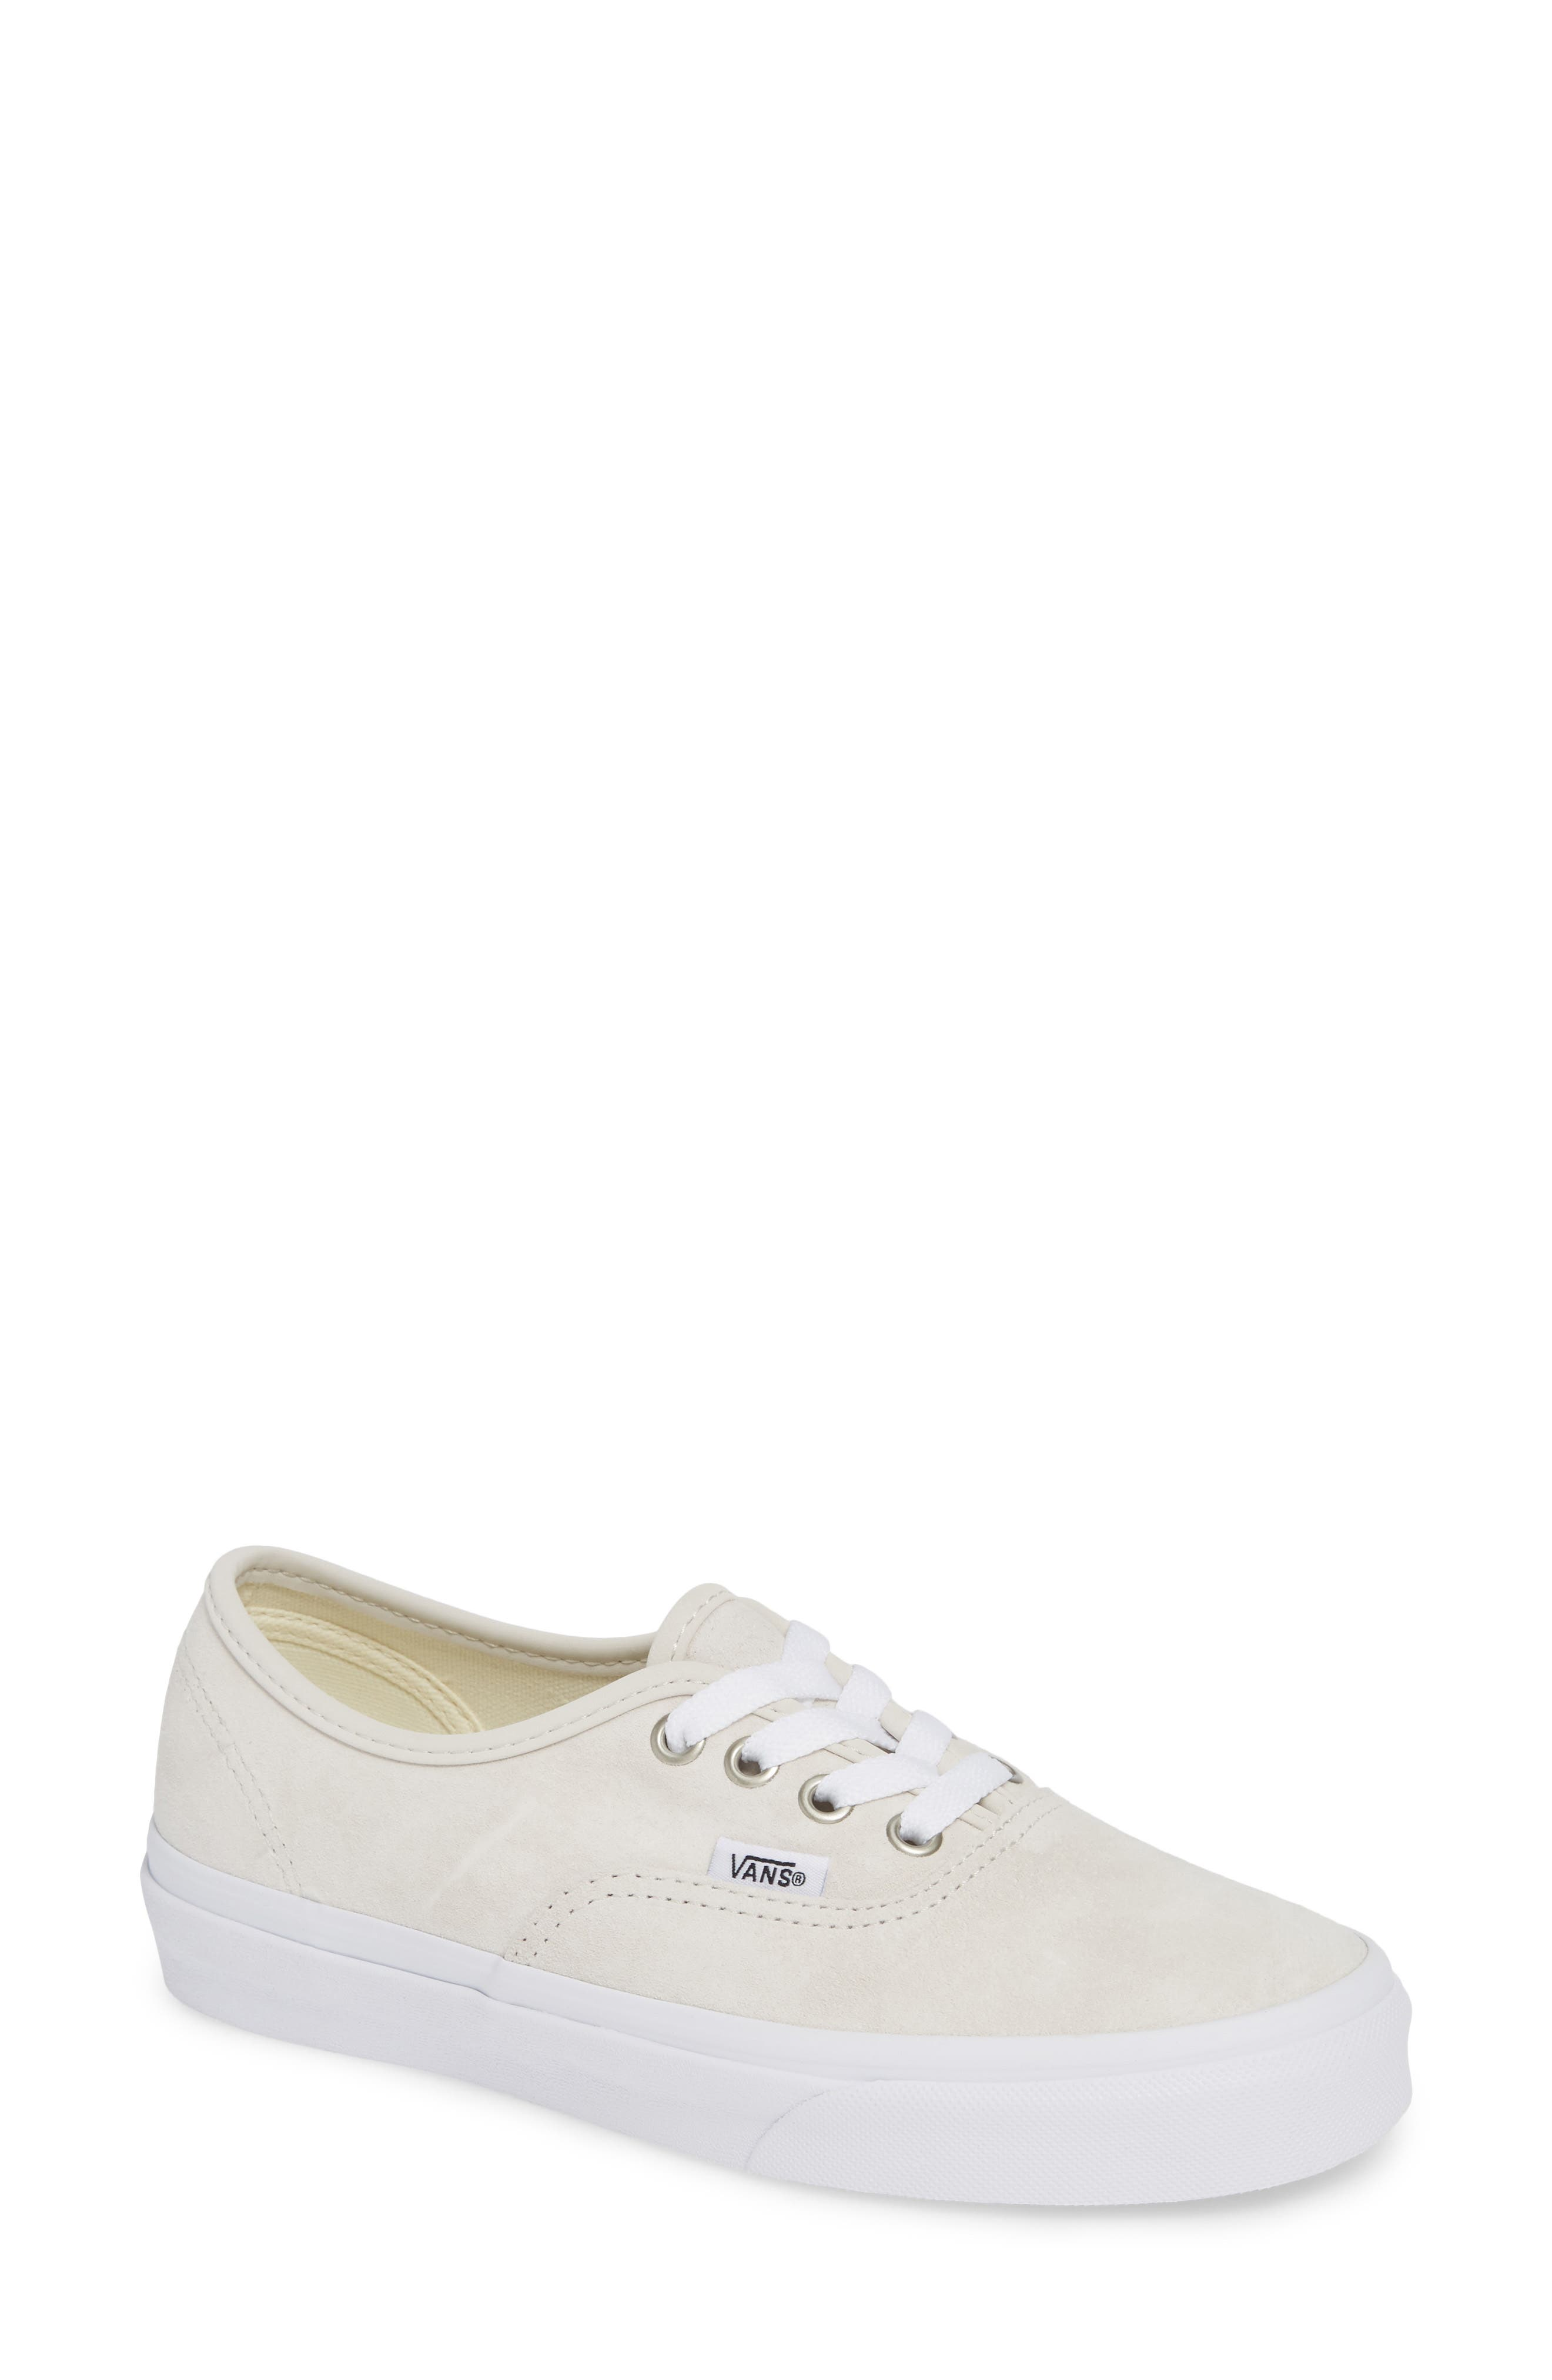 UA Authentic Sneaker,                         Main,                         color, 270